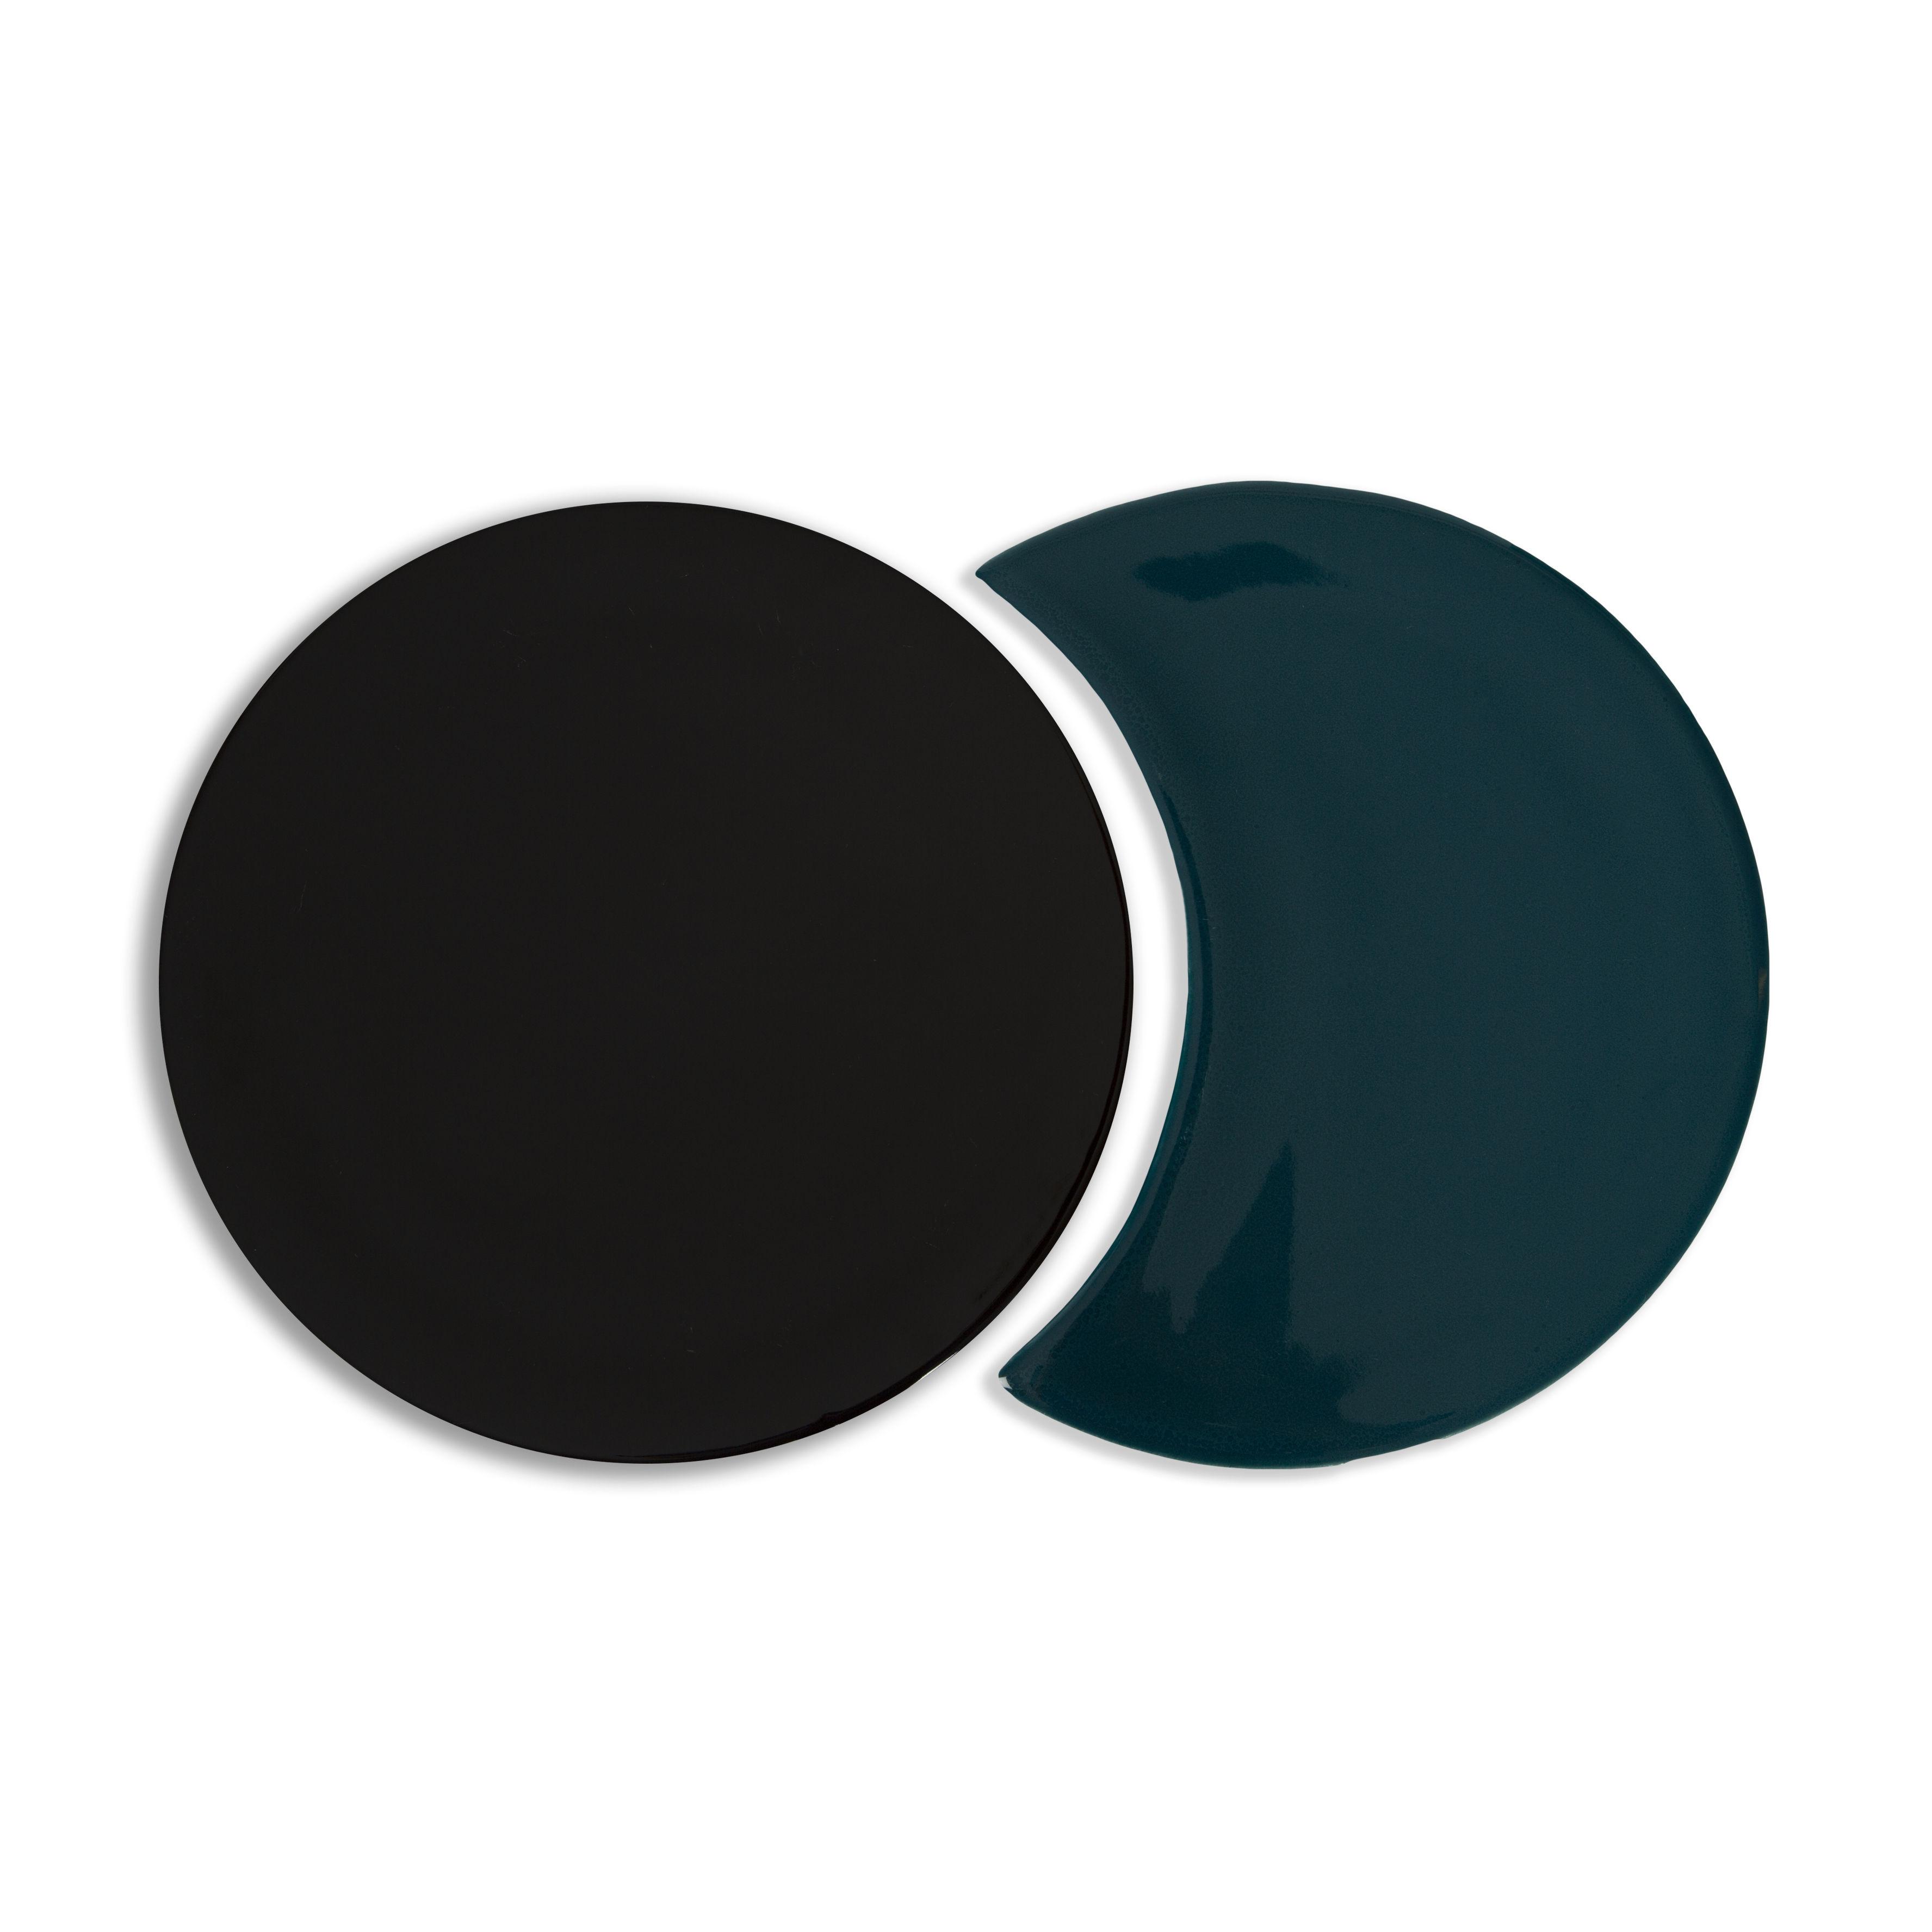 Tableware - Table Mats & Trivets - Eclipse Tablemat - / Ceramic - Set of 2 interlocking shapes by Maison Sarah Lavoine - Sarah blue - Ceramic